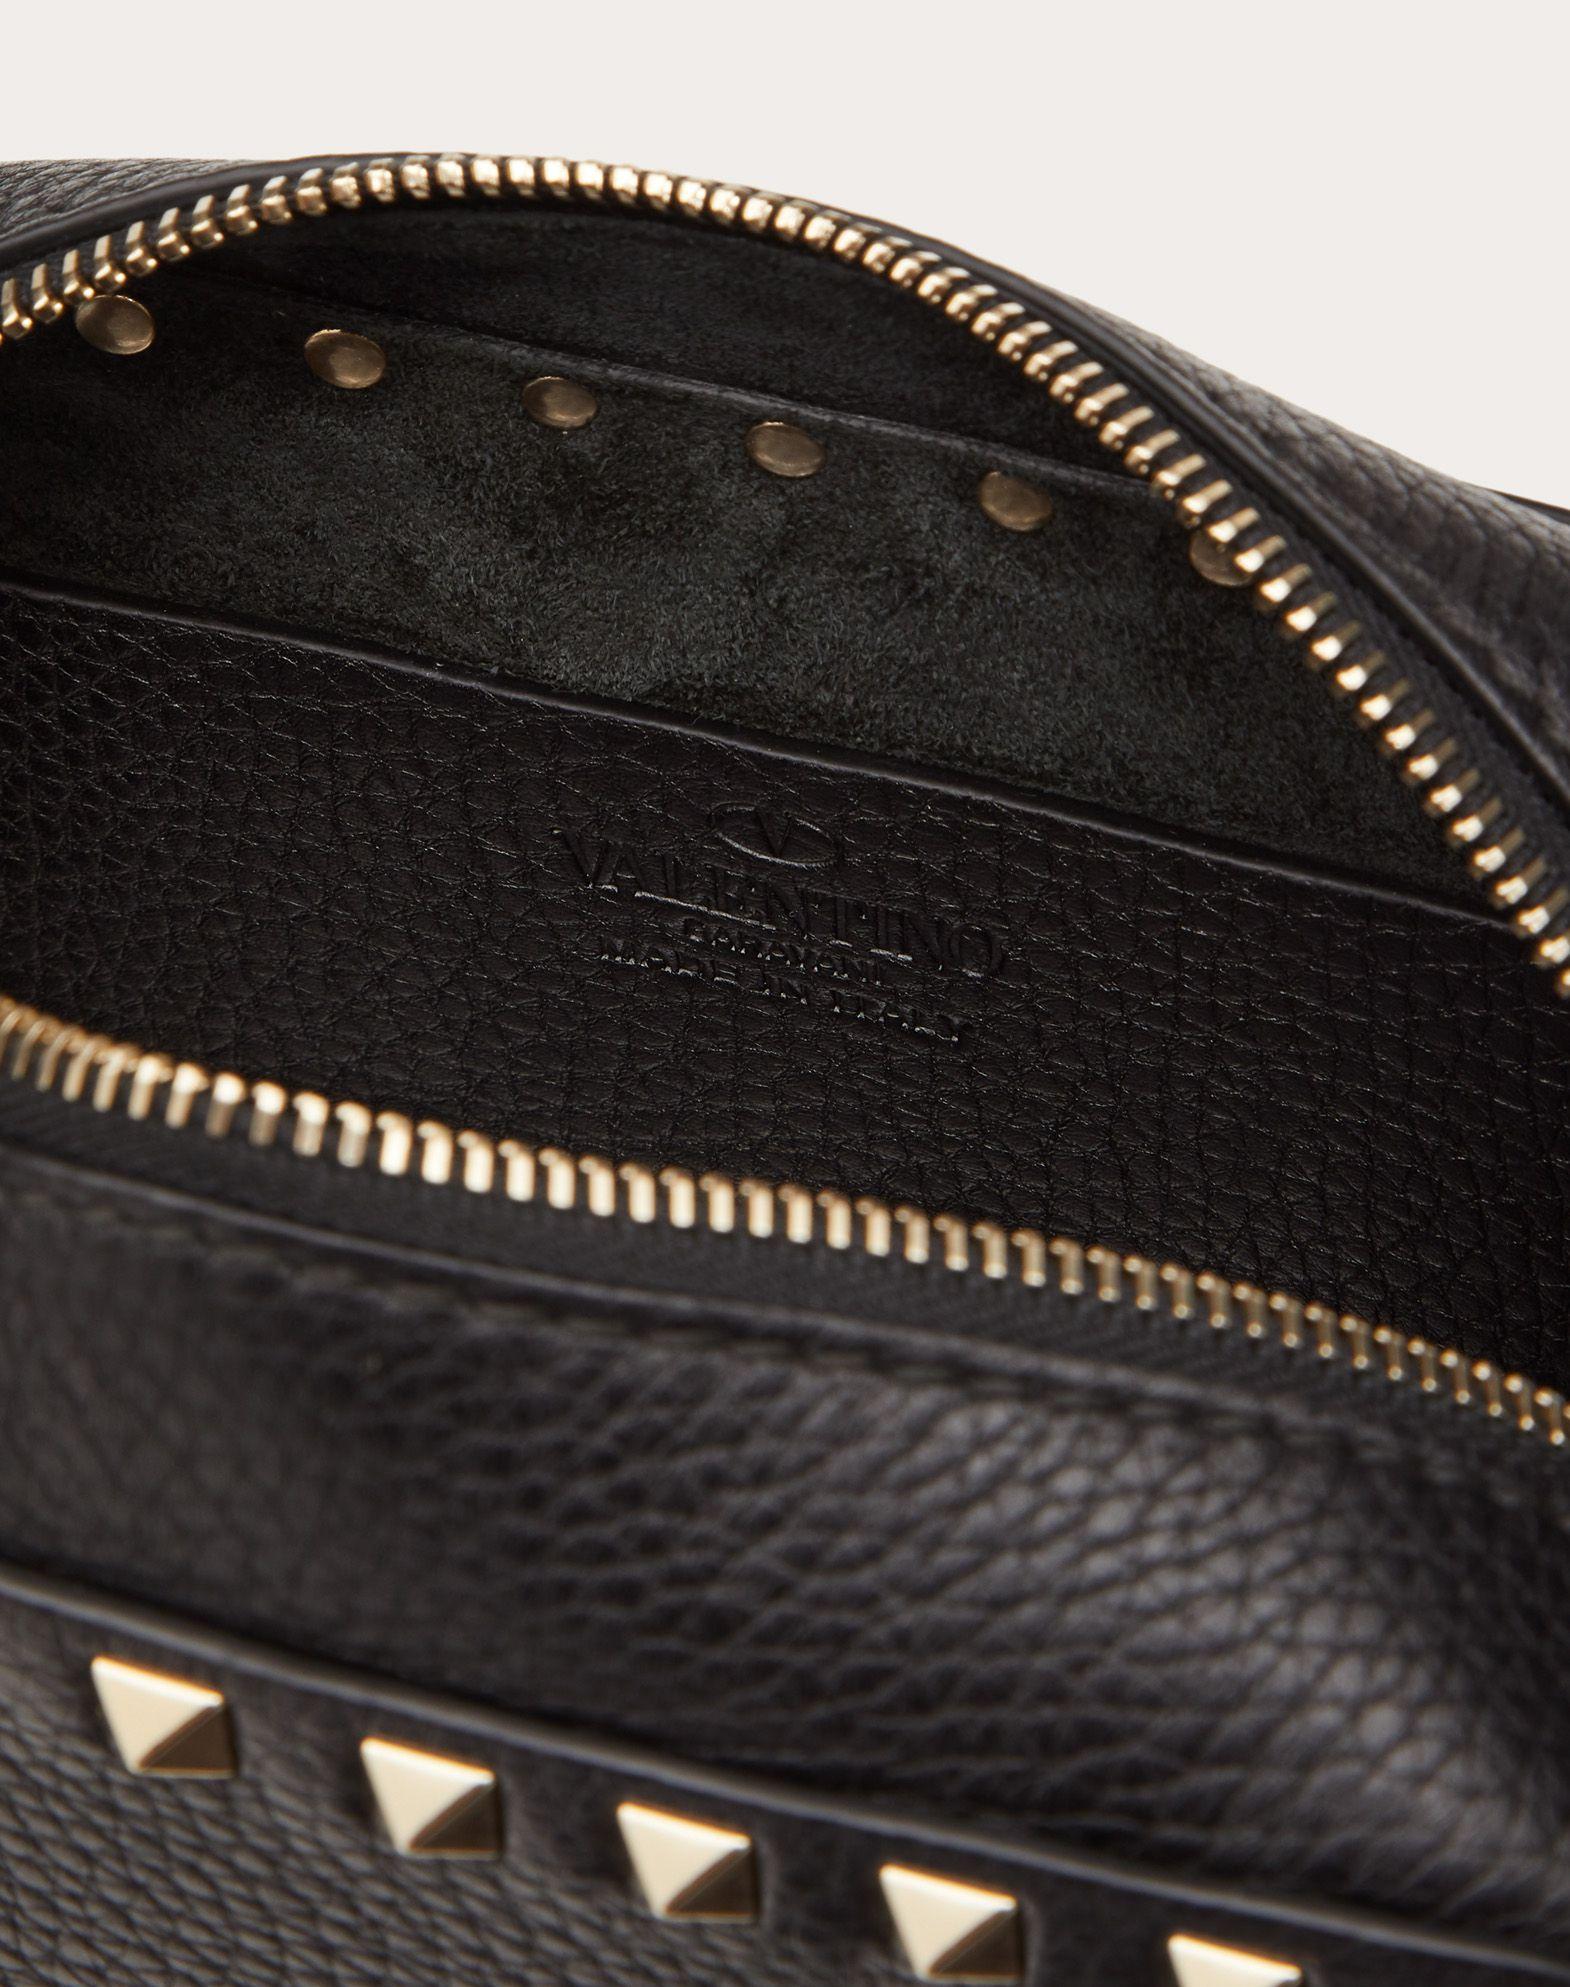 VALENTINO GARAVANI Rockstud Cross Body Bag CROSS BODY BAG D a